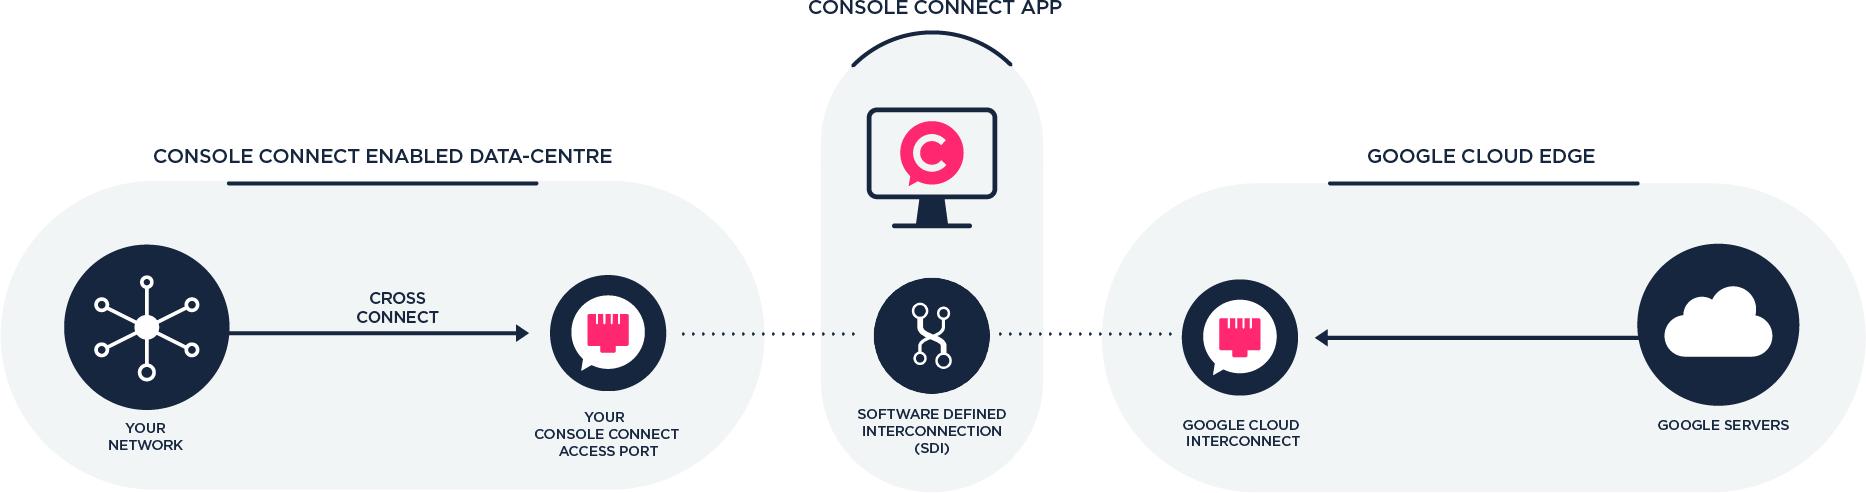 Console Connect Diagram Google